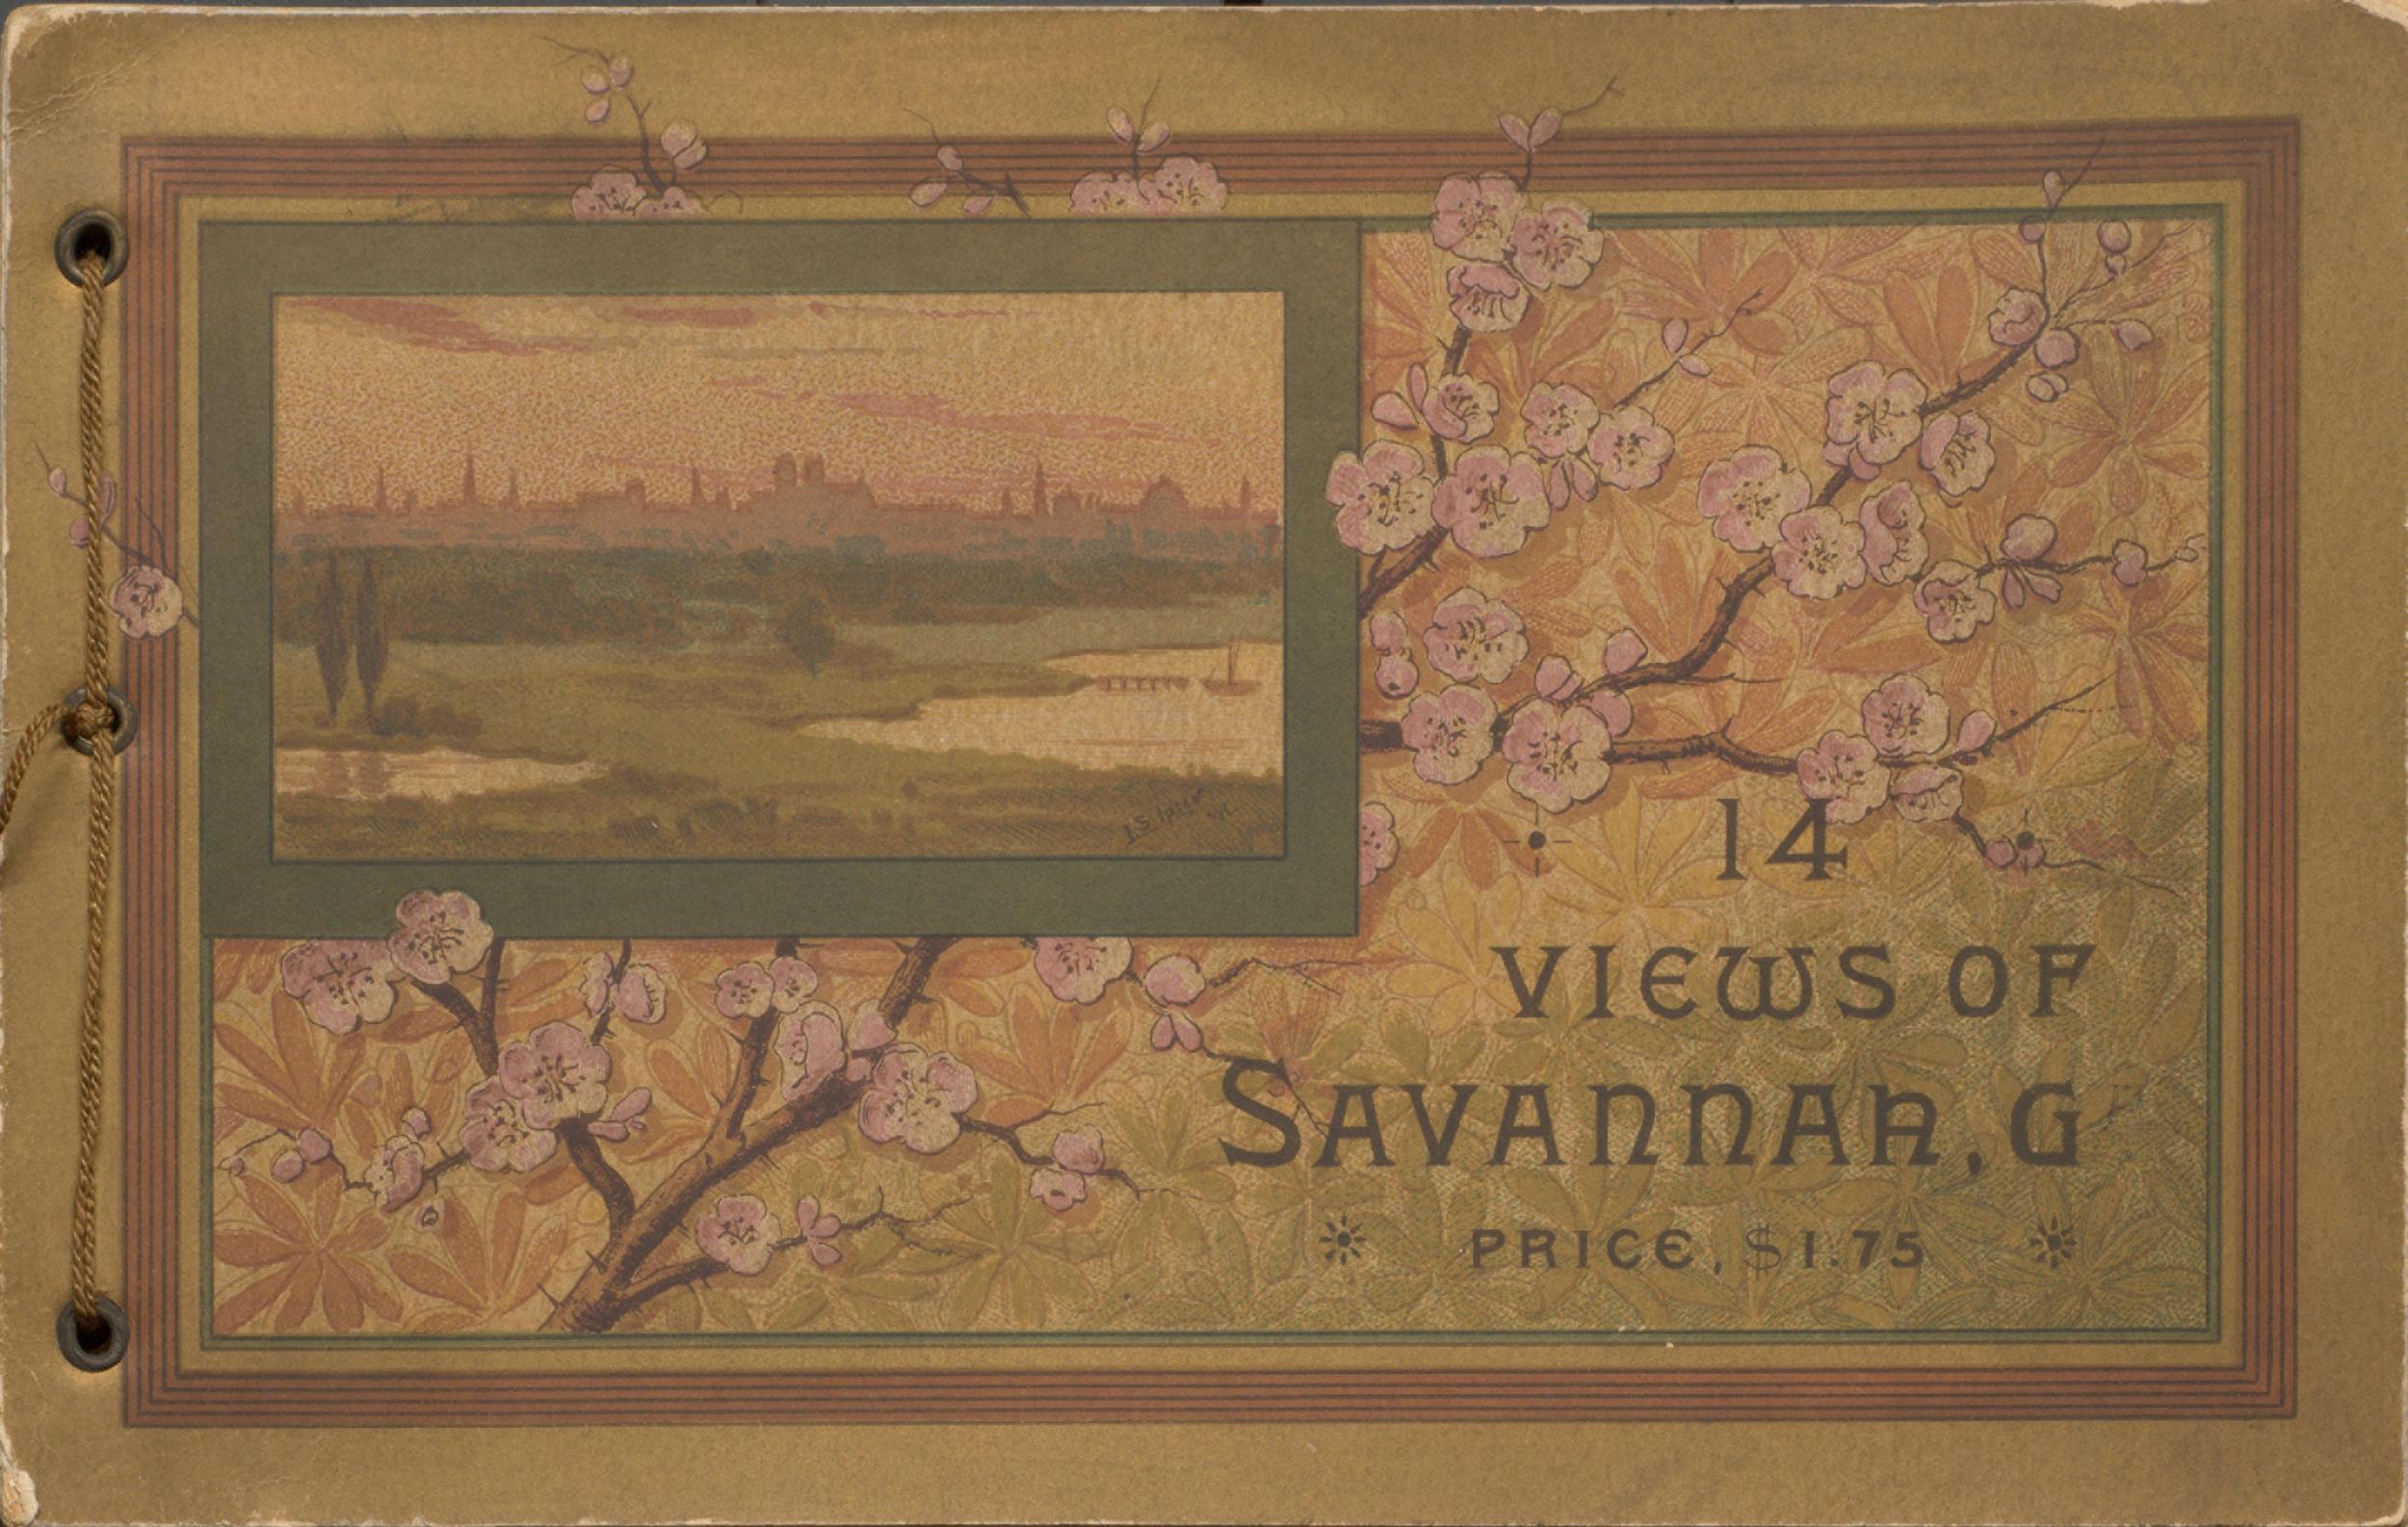 14 Views of Savannah, Ga. Cover.